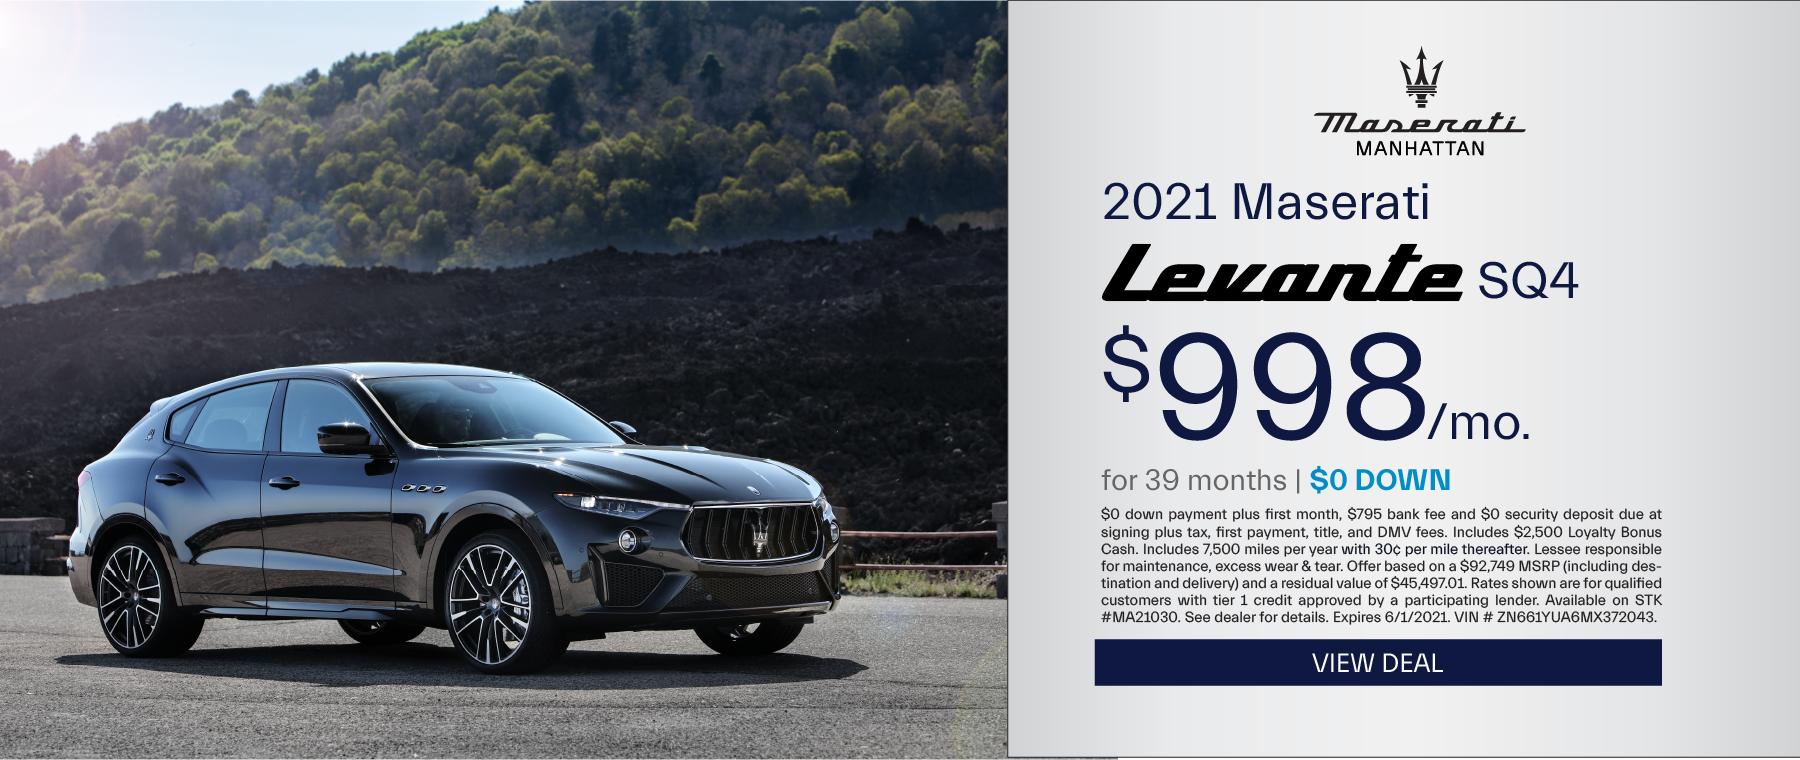 Maserati of Manhattan – 2021 Levante SQ4 – May 2021